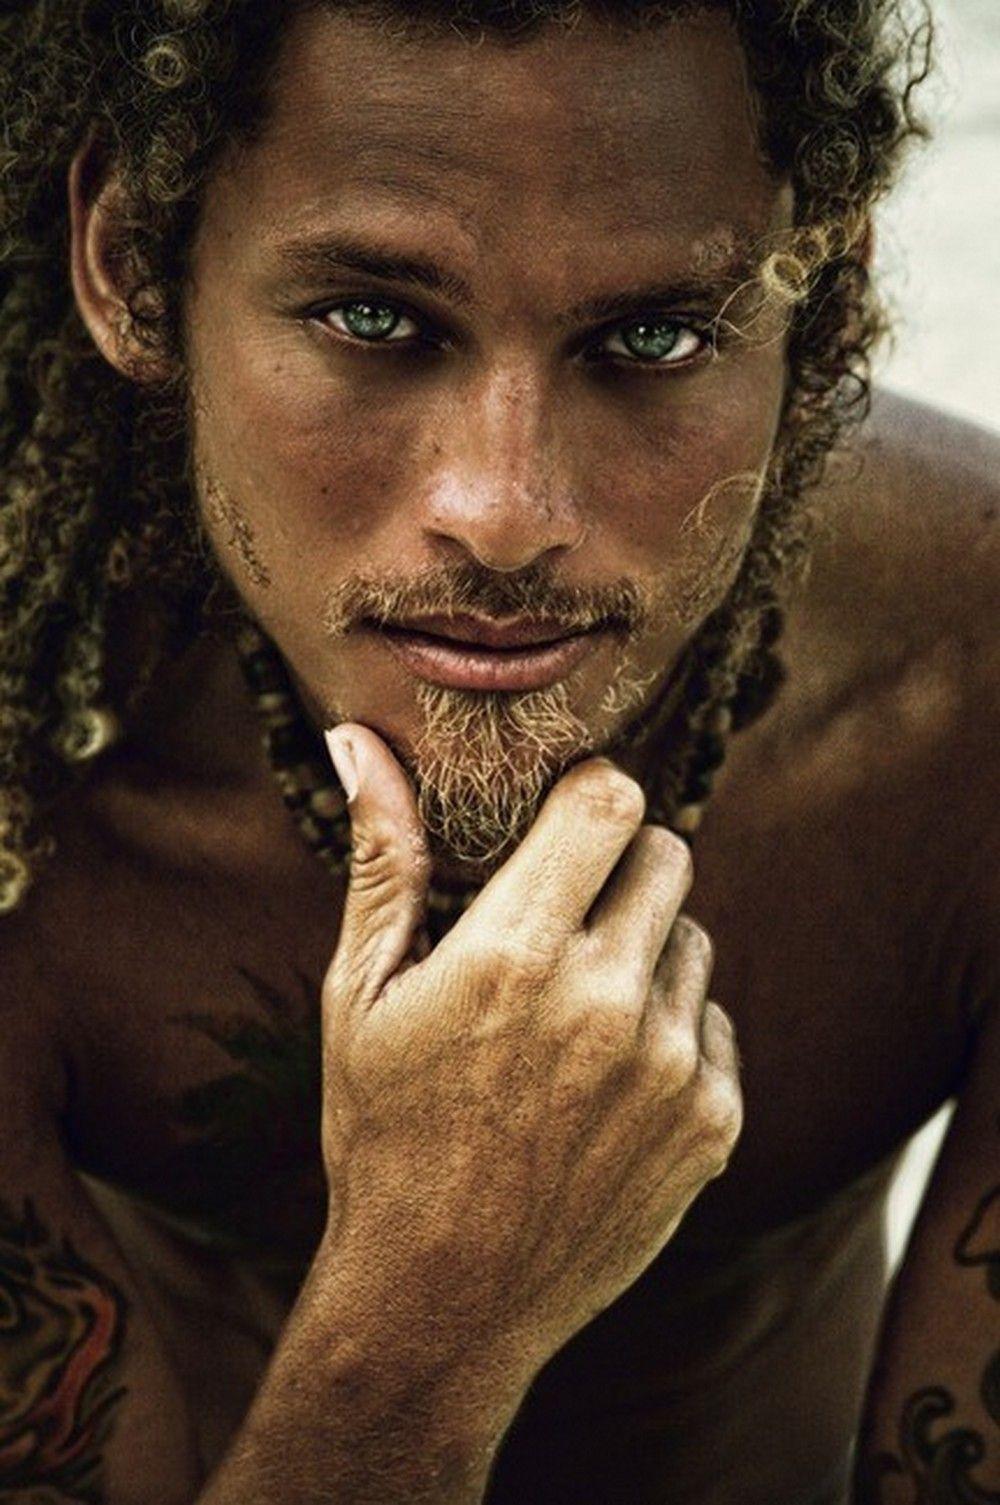 photographe cherche modele homme